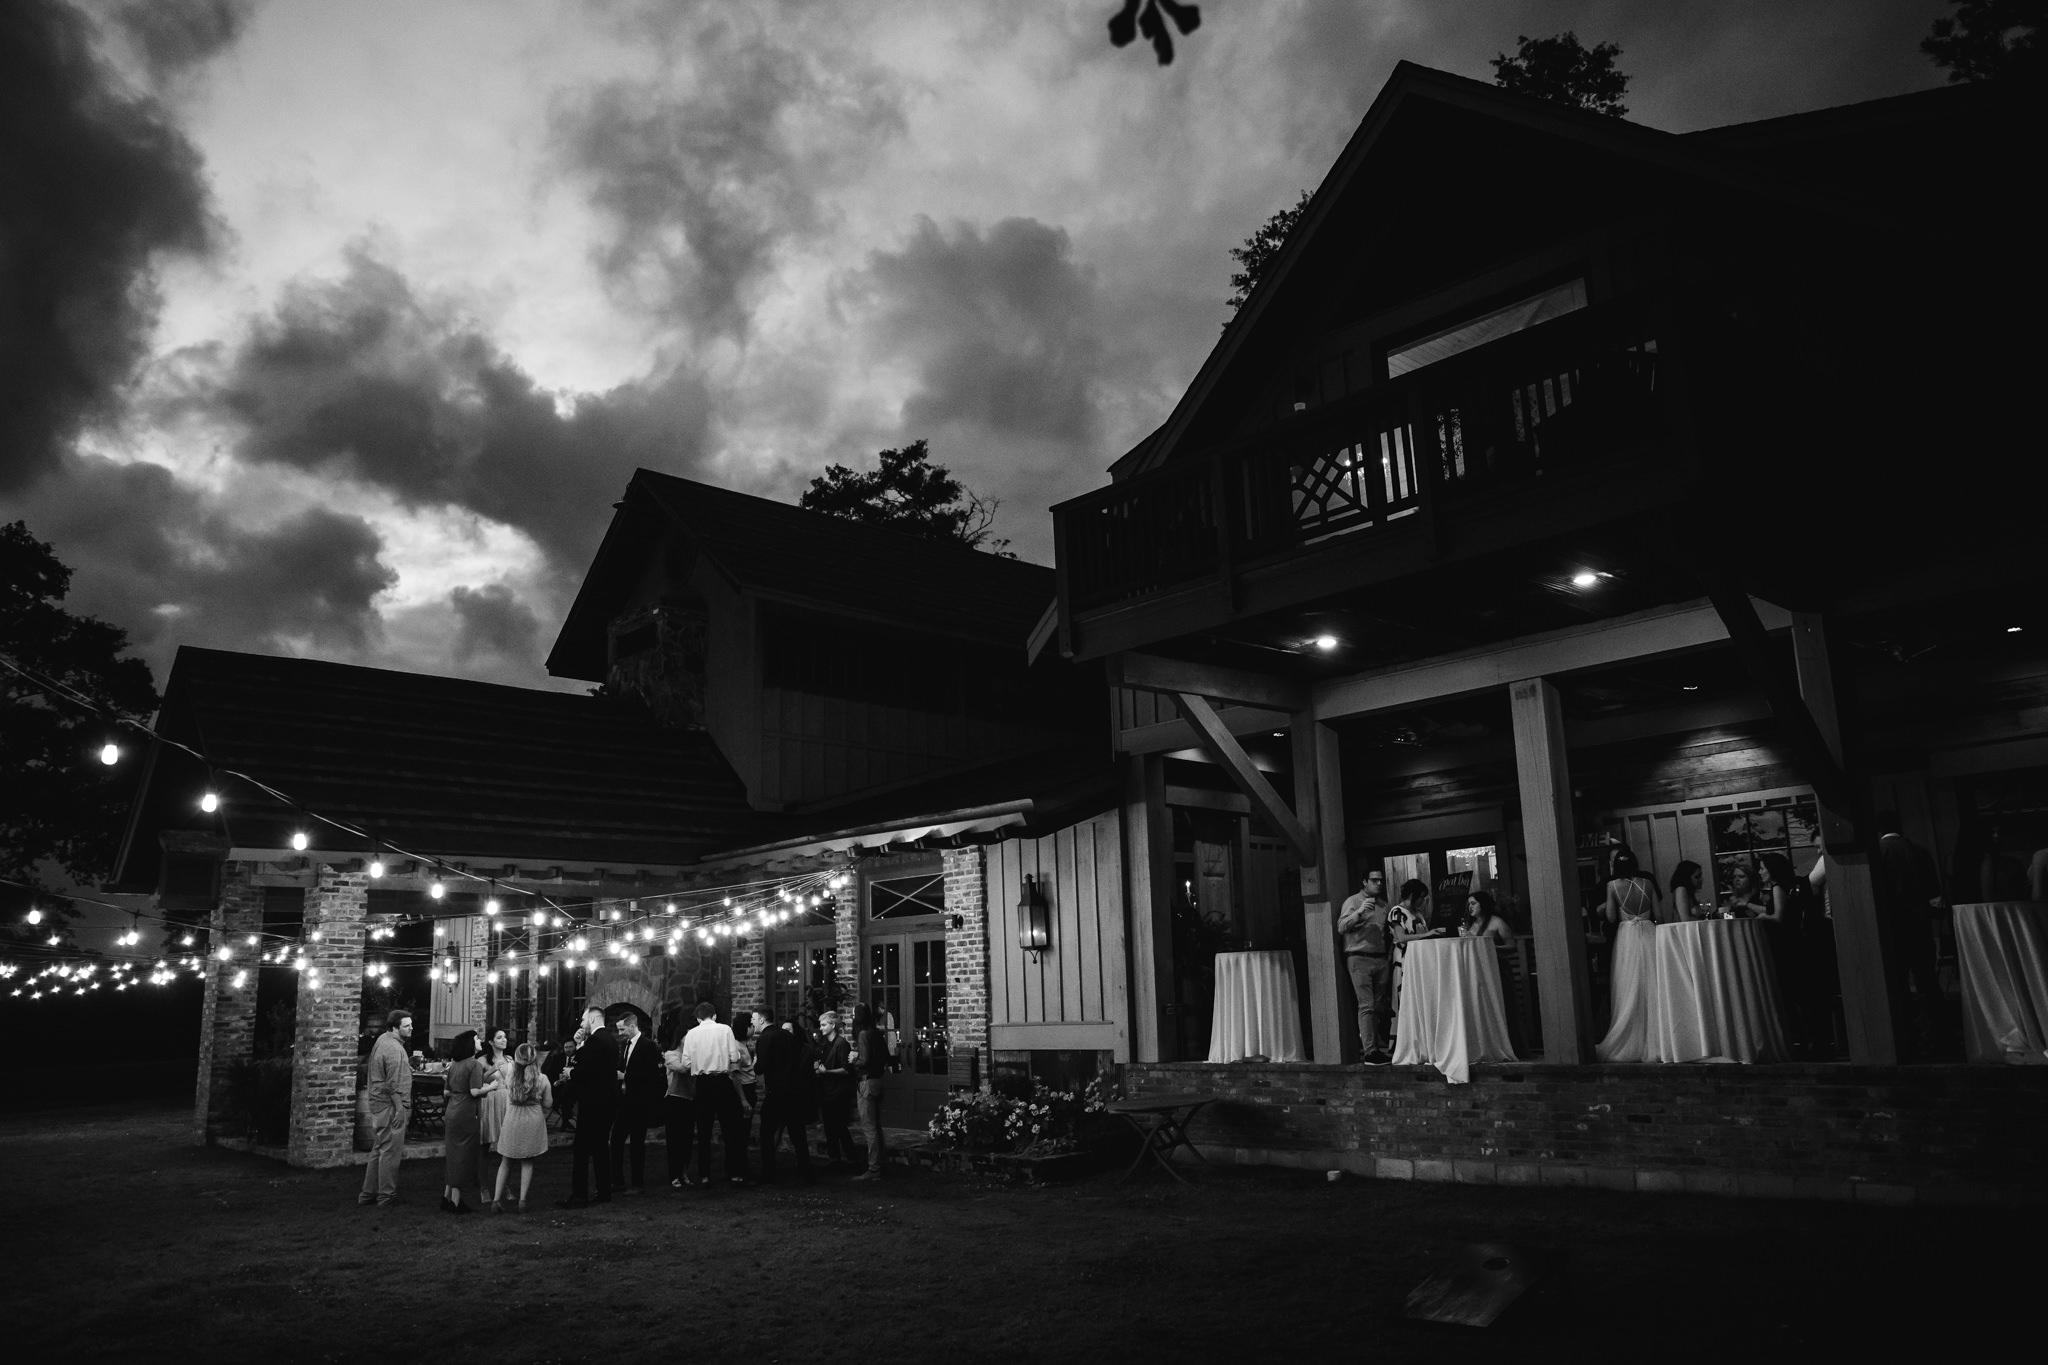 phantom-canyon-brewery-colorado-springs-wedding-photographer-448.jpg